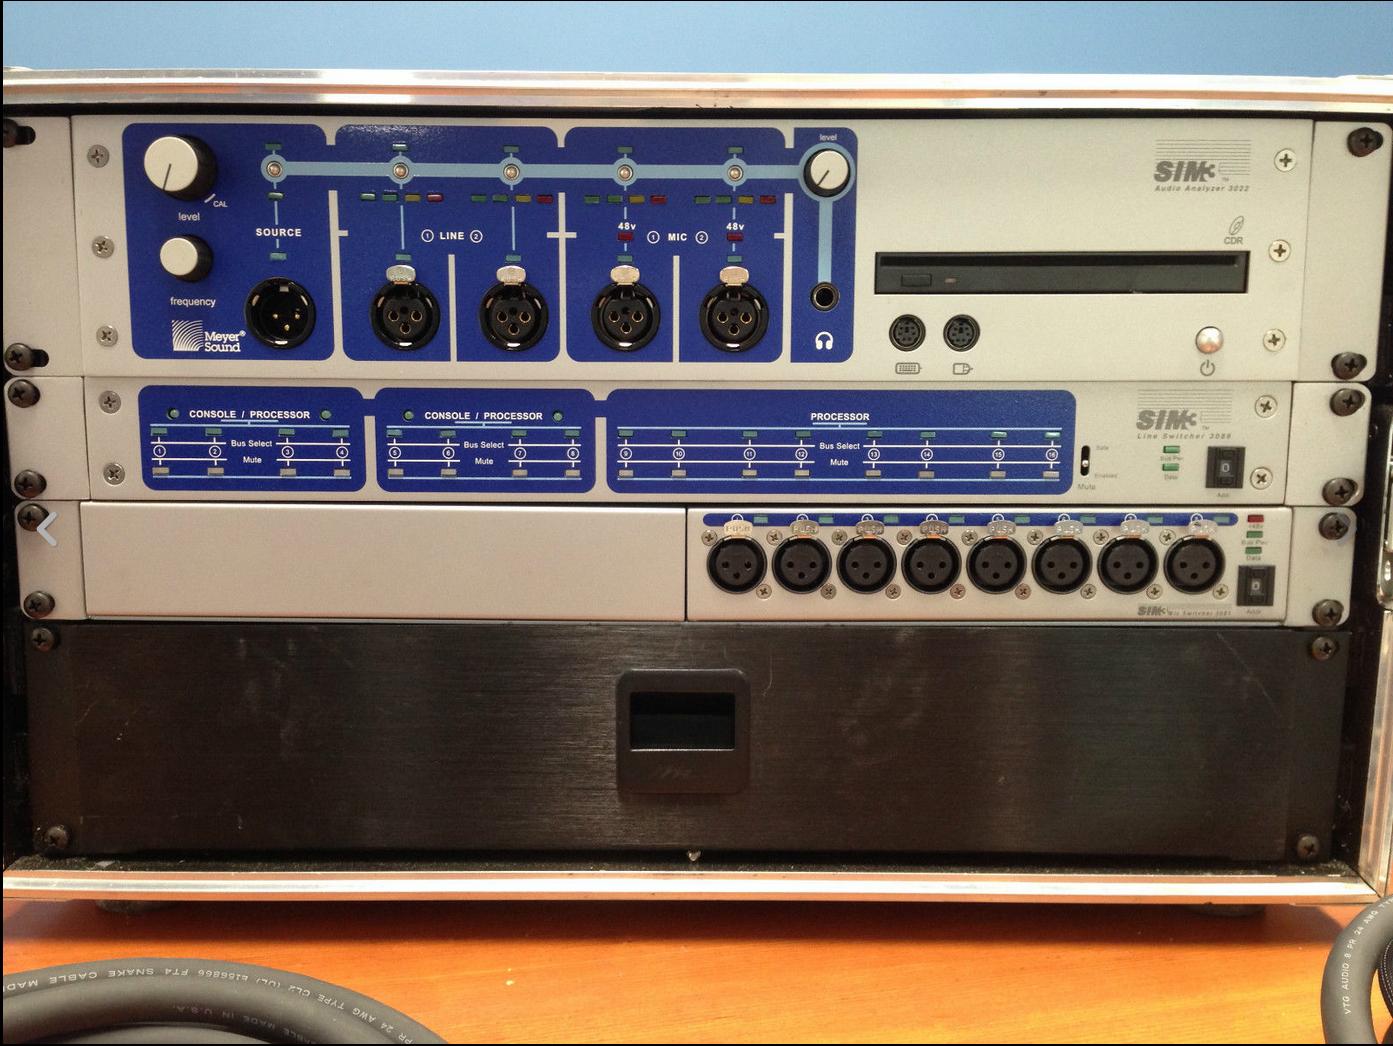 Solotech Meyer Sound SIM 3 rig 3